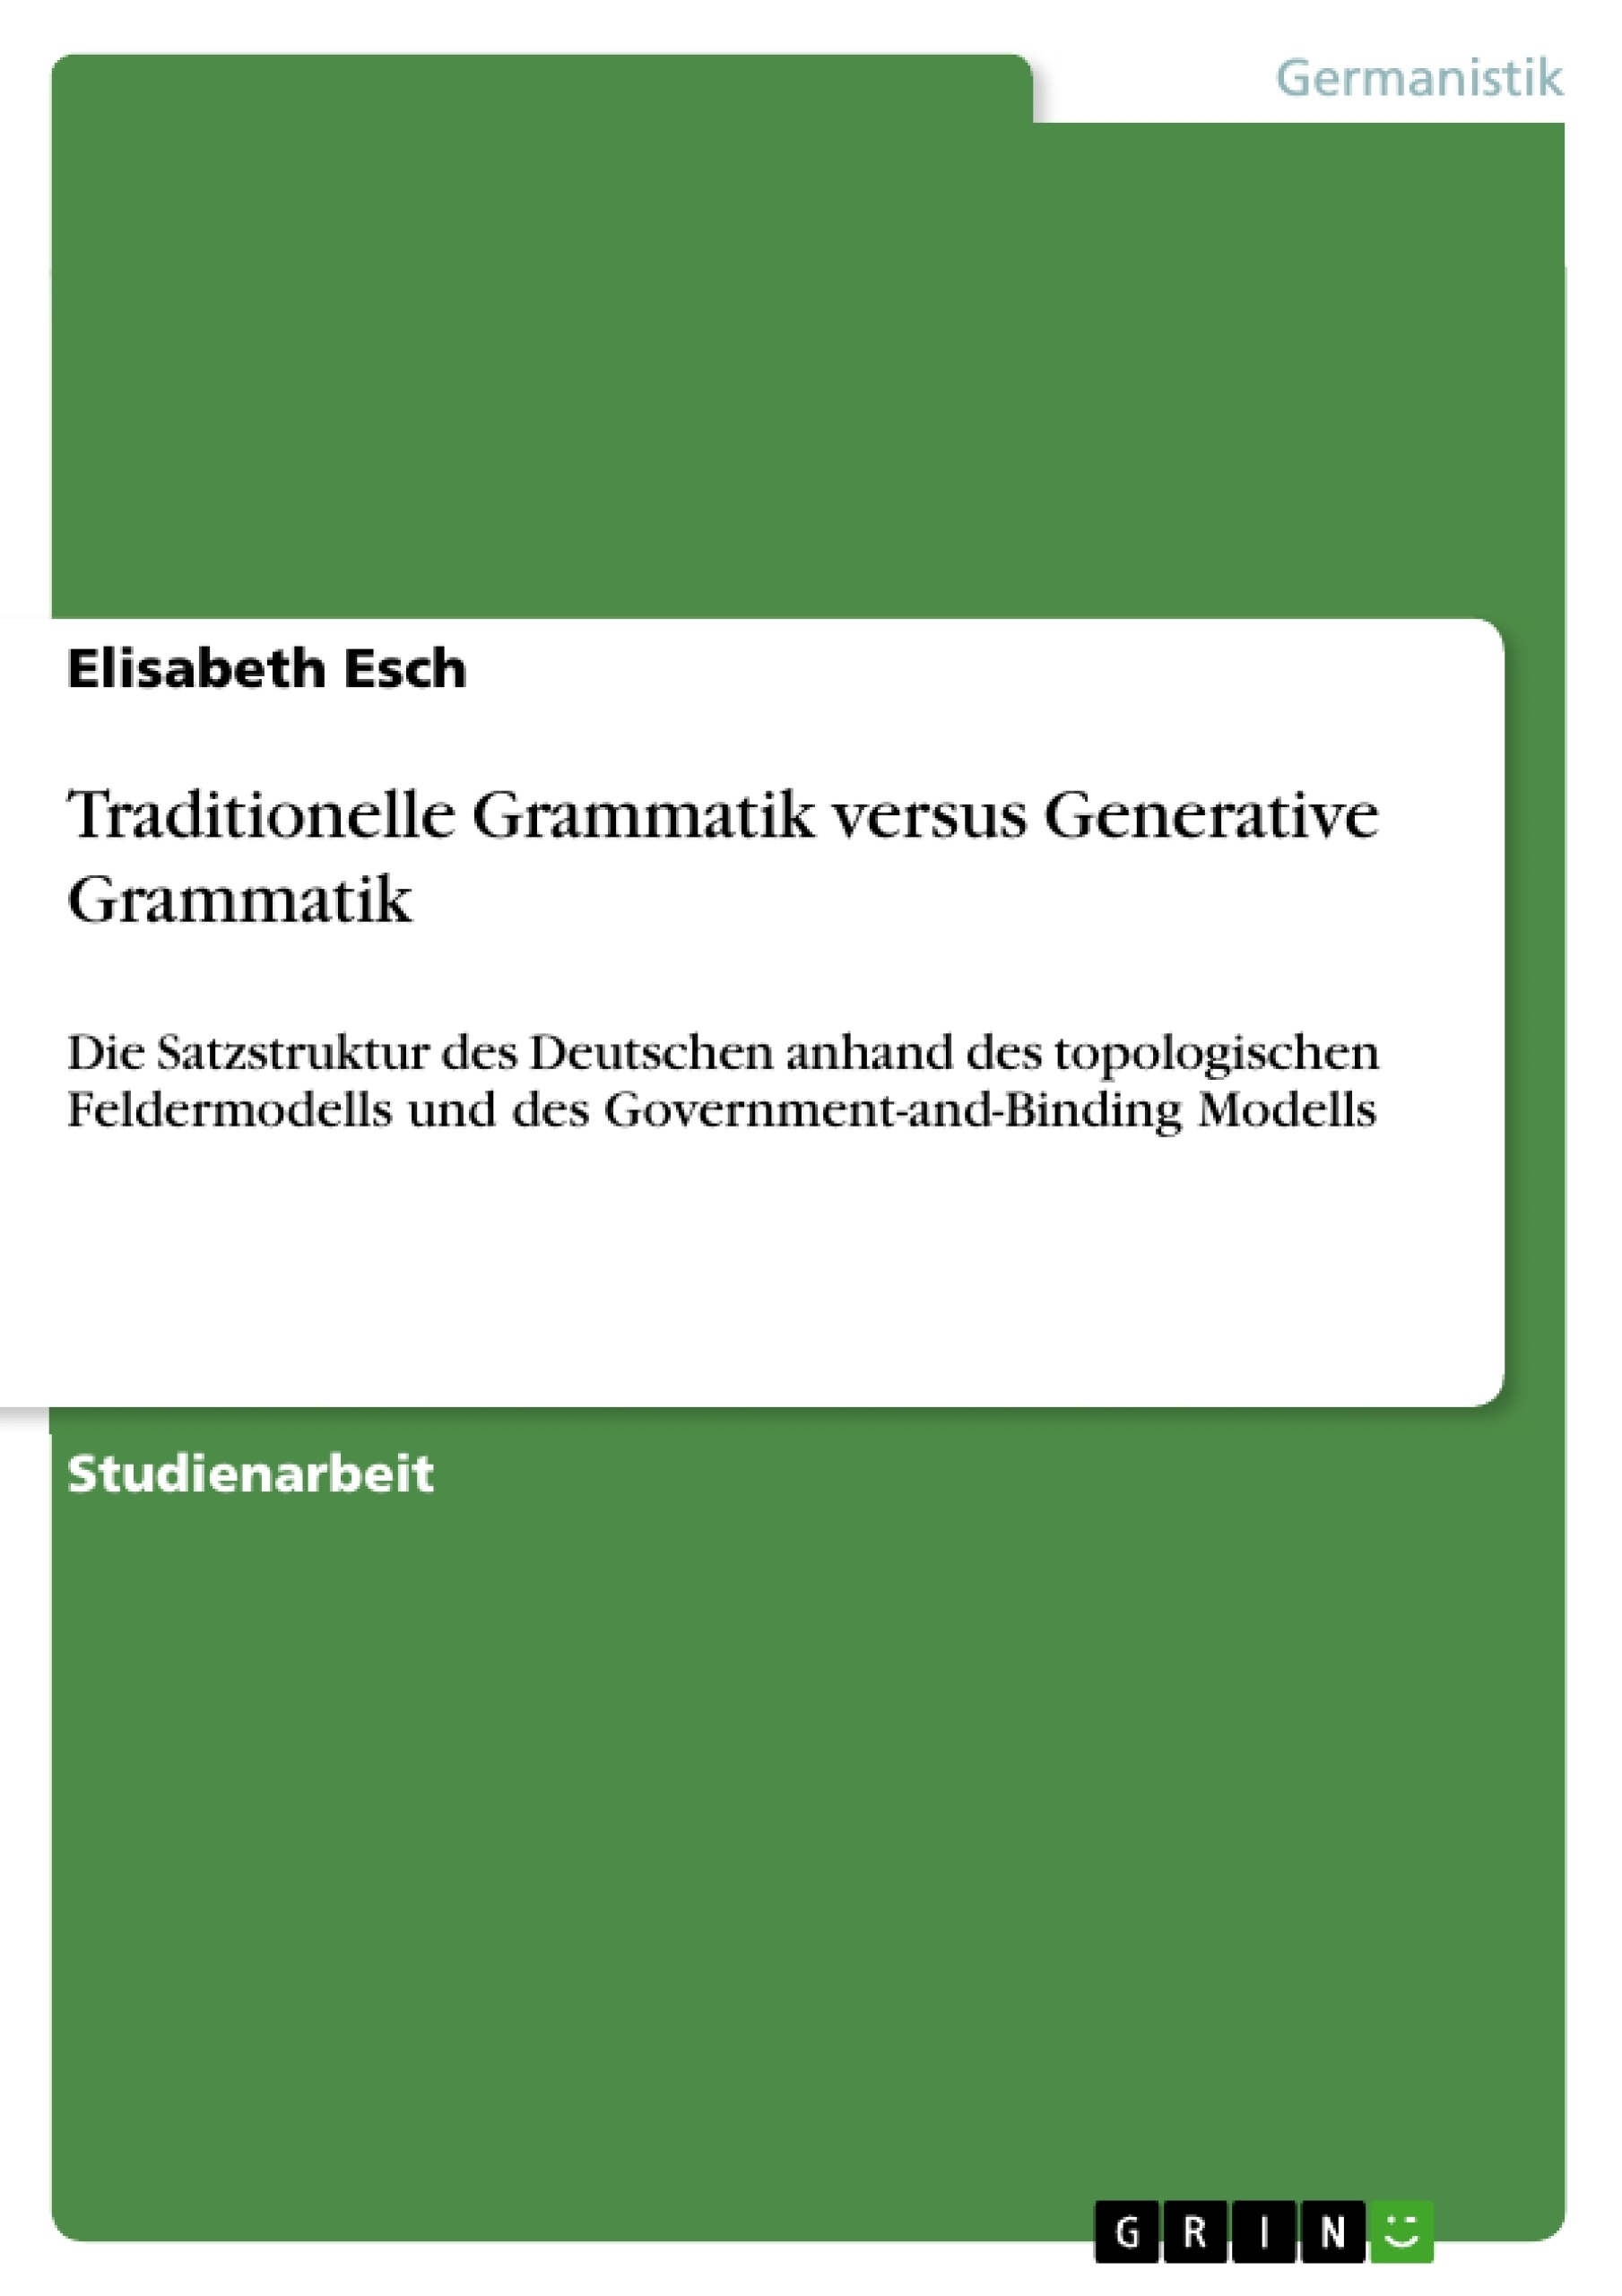 Titel: Traditionelle Grammatik versus Generative Grammatik